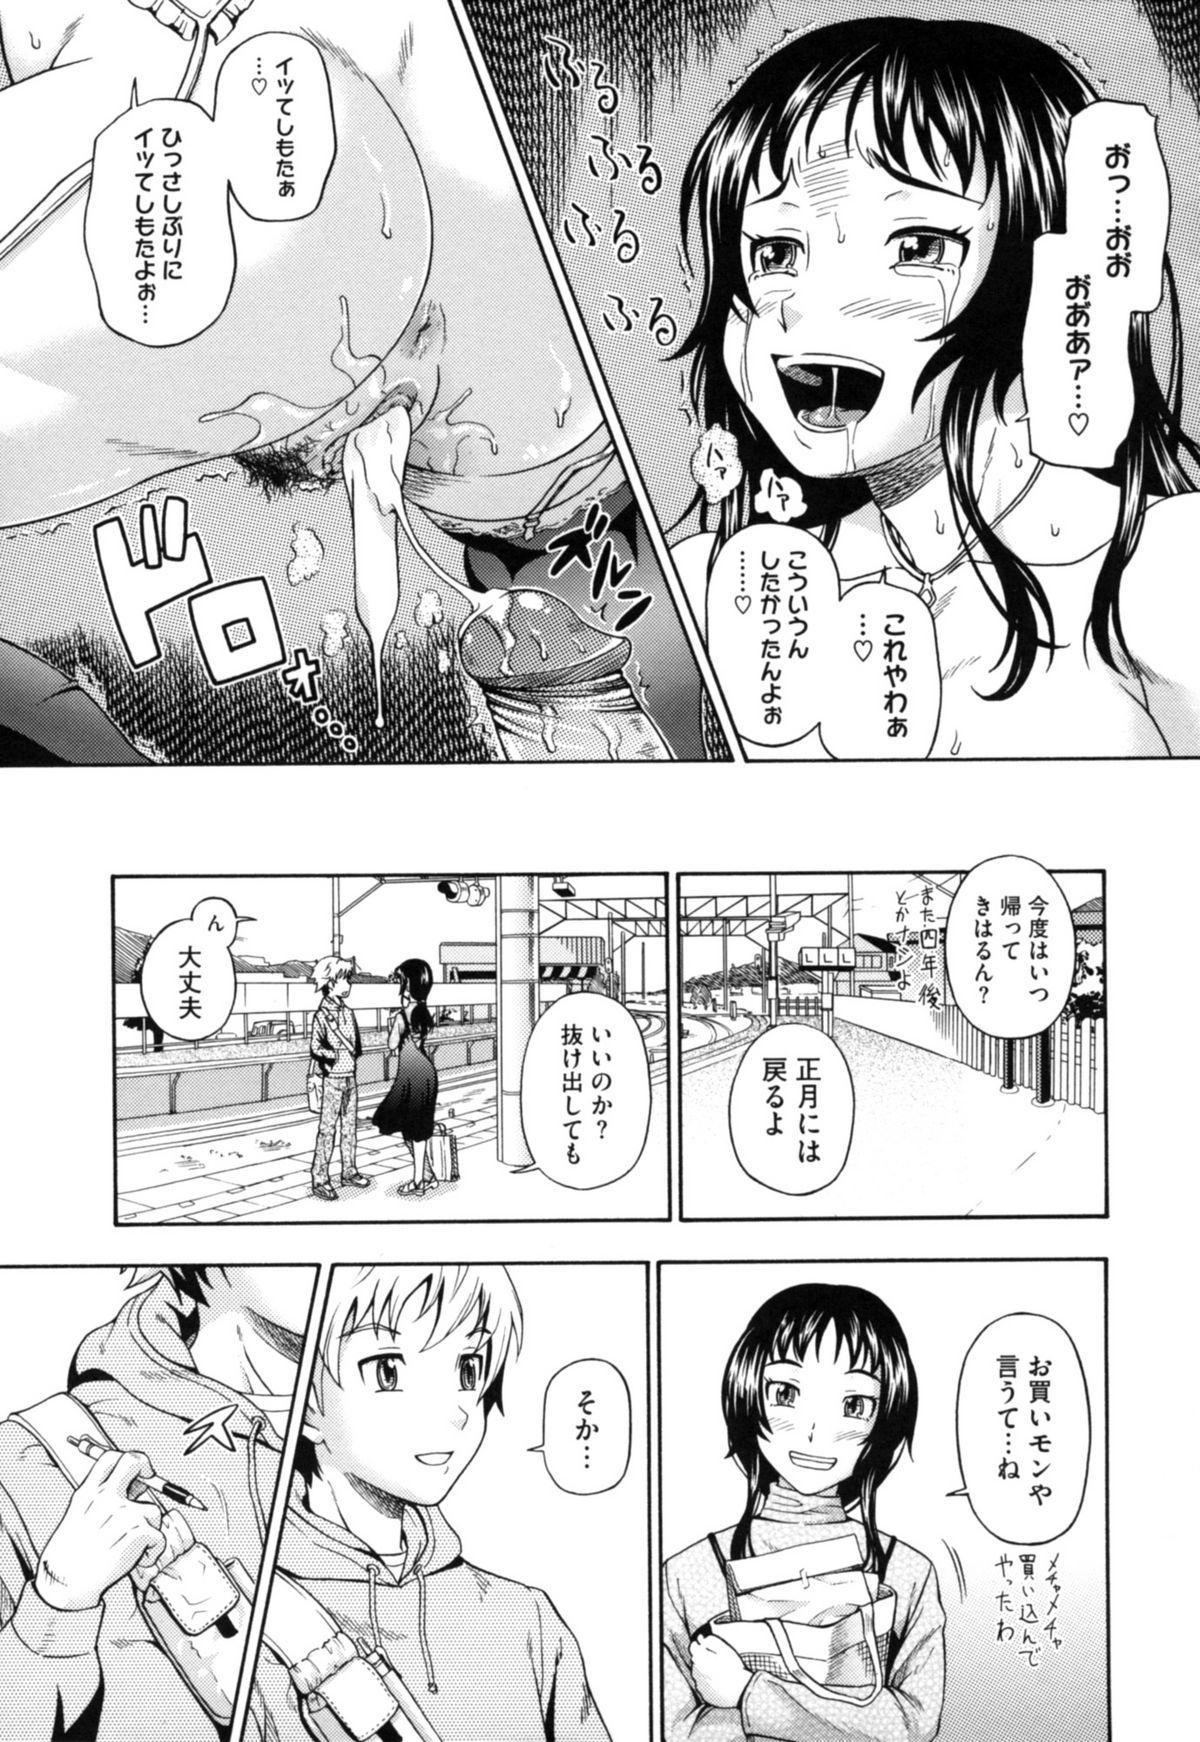 Soushisouai Note Nisatsume 192